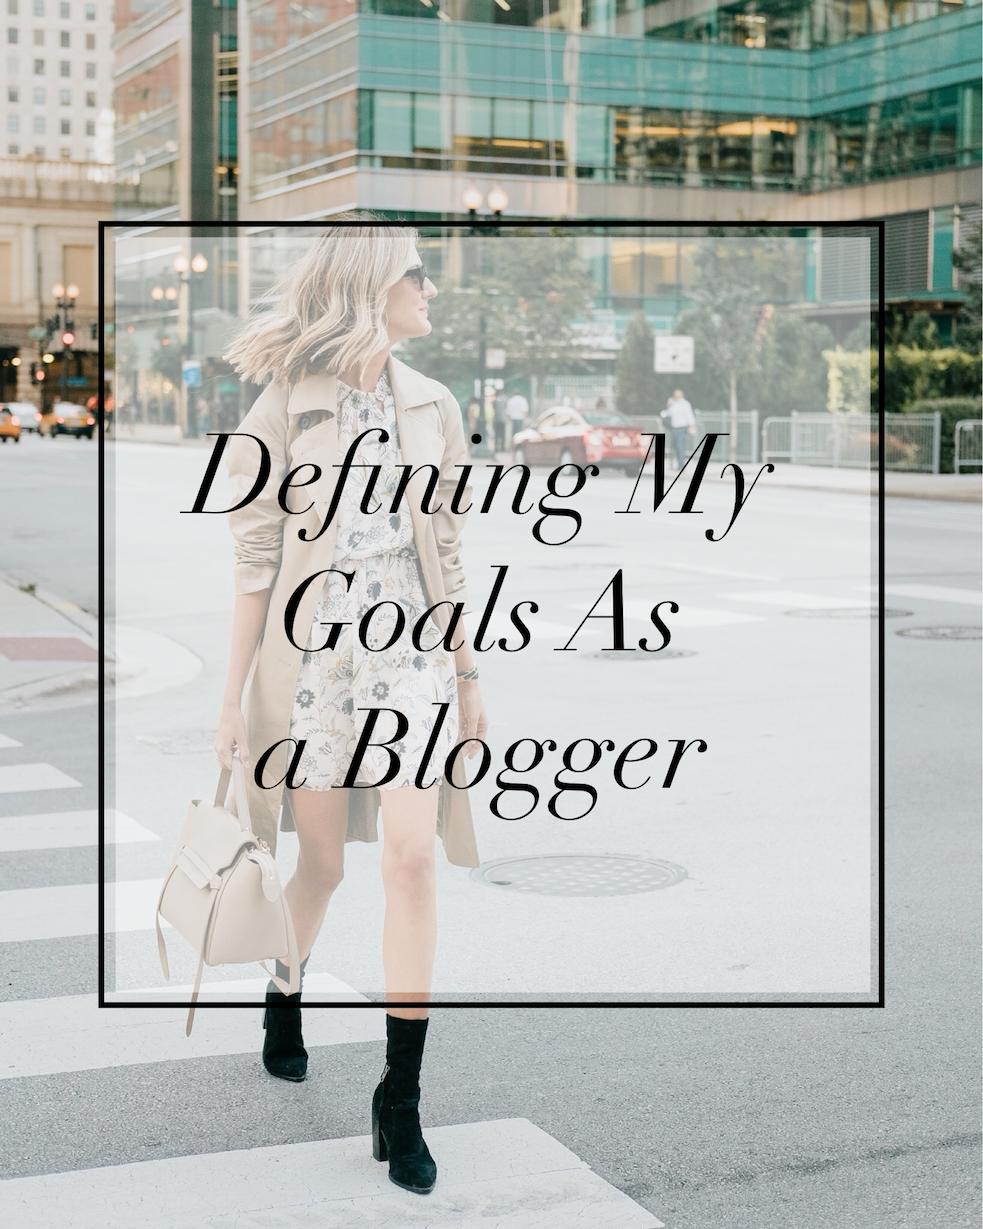 influencer blogging goals